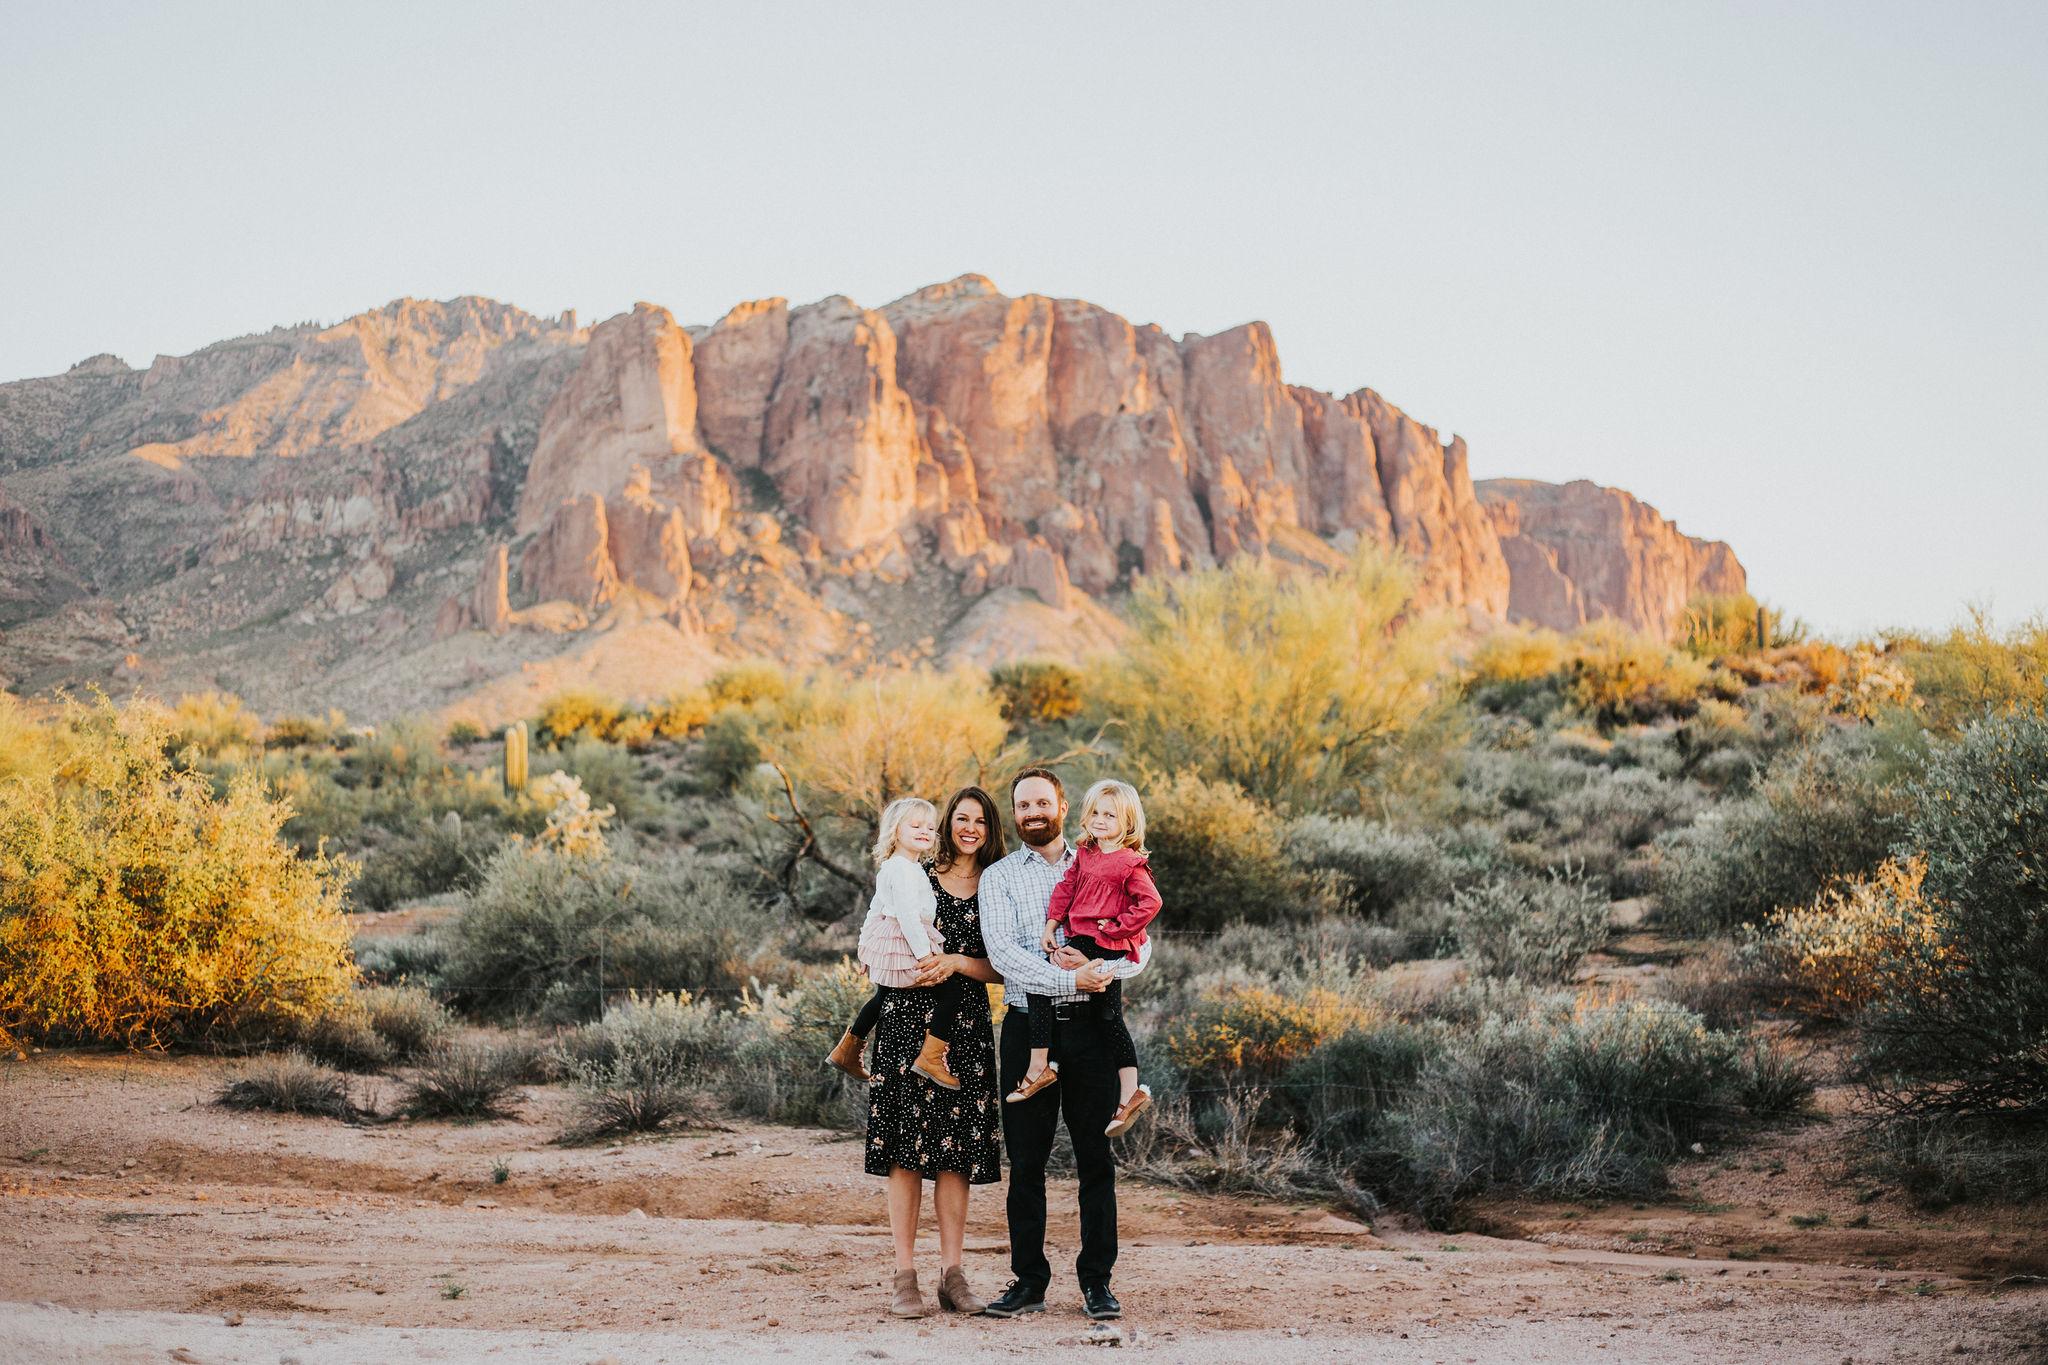 Family portrait | Natural light desert lifestyle family photography session | Lost Dutchman Mesa Arizona